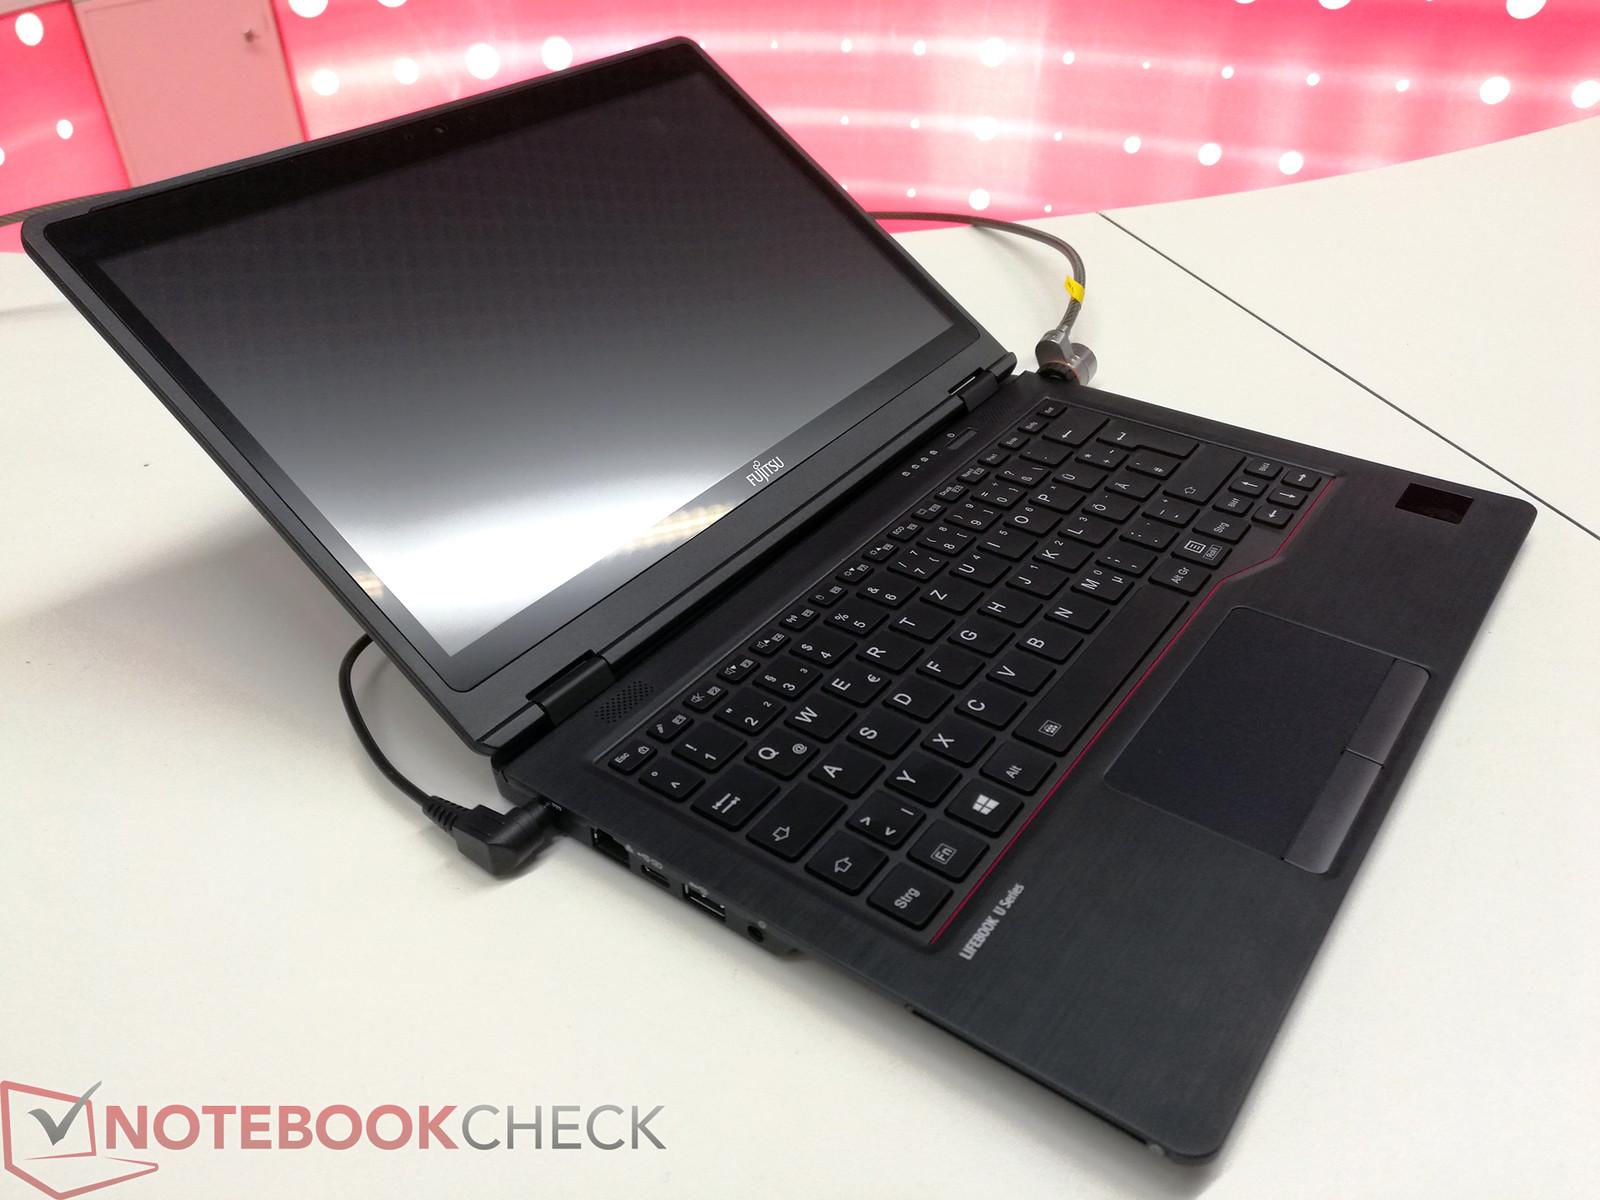 fujitsu unveils new u series notebooks with kaby lake